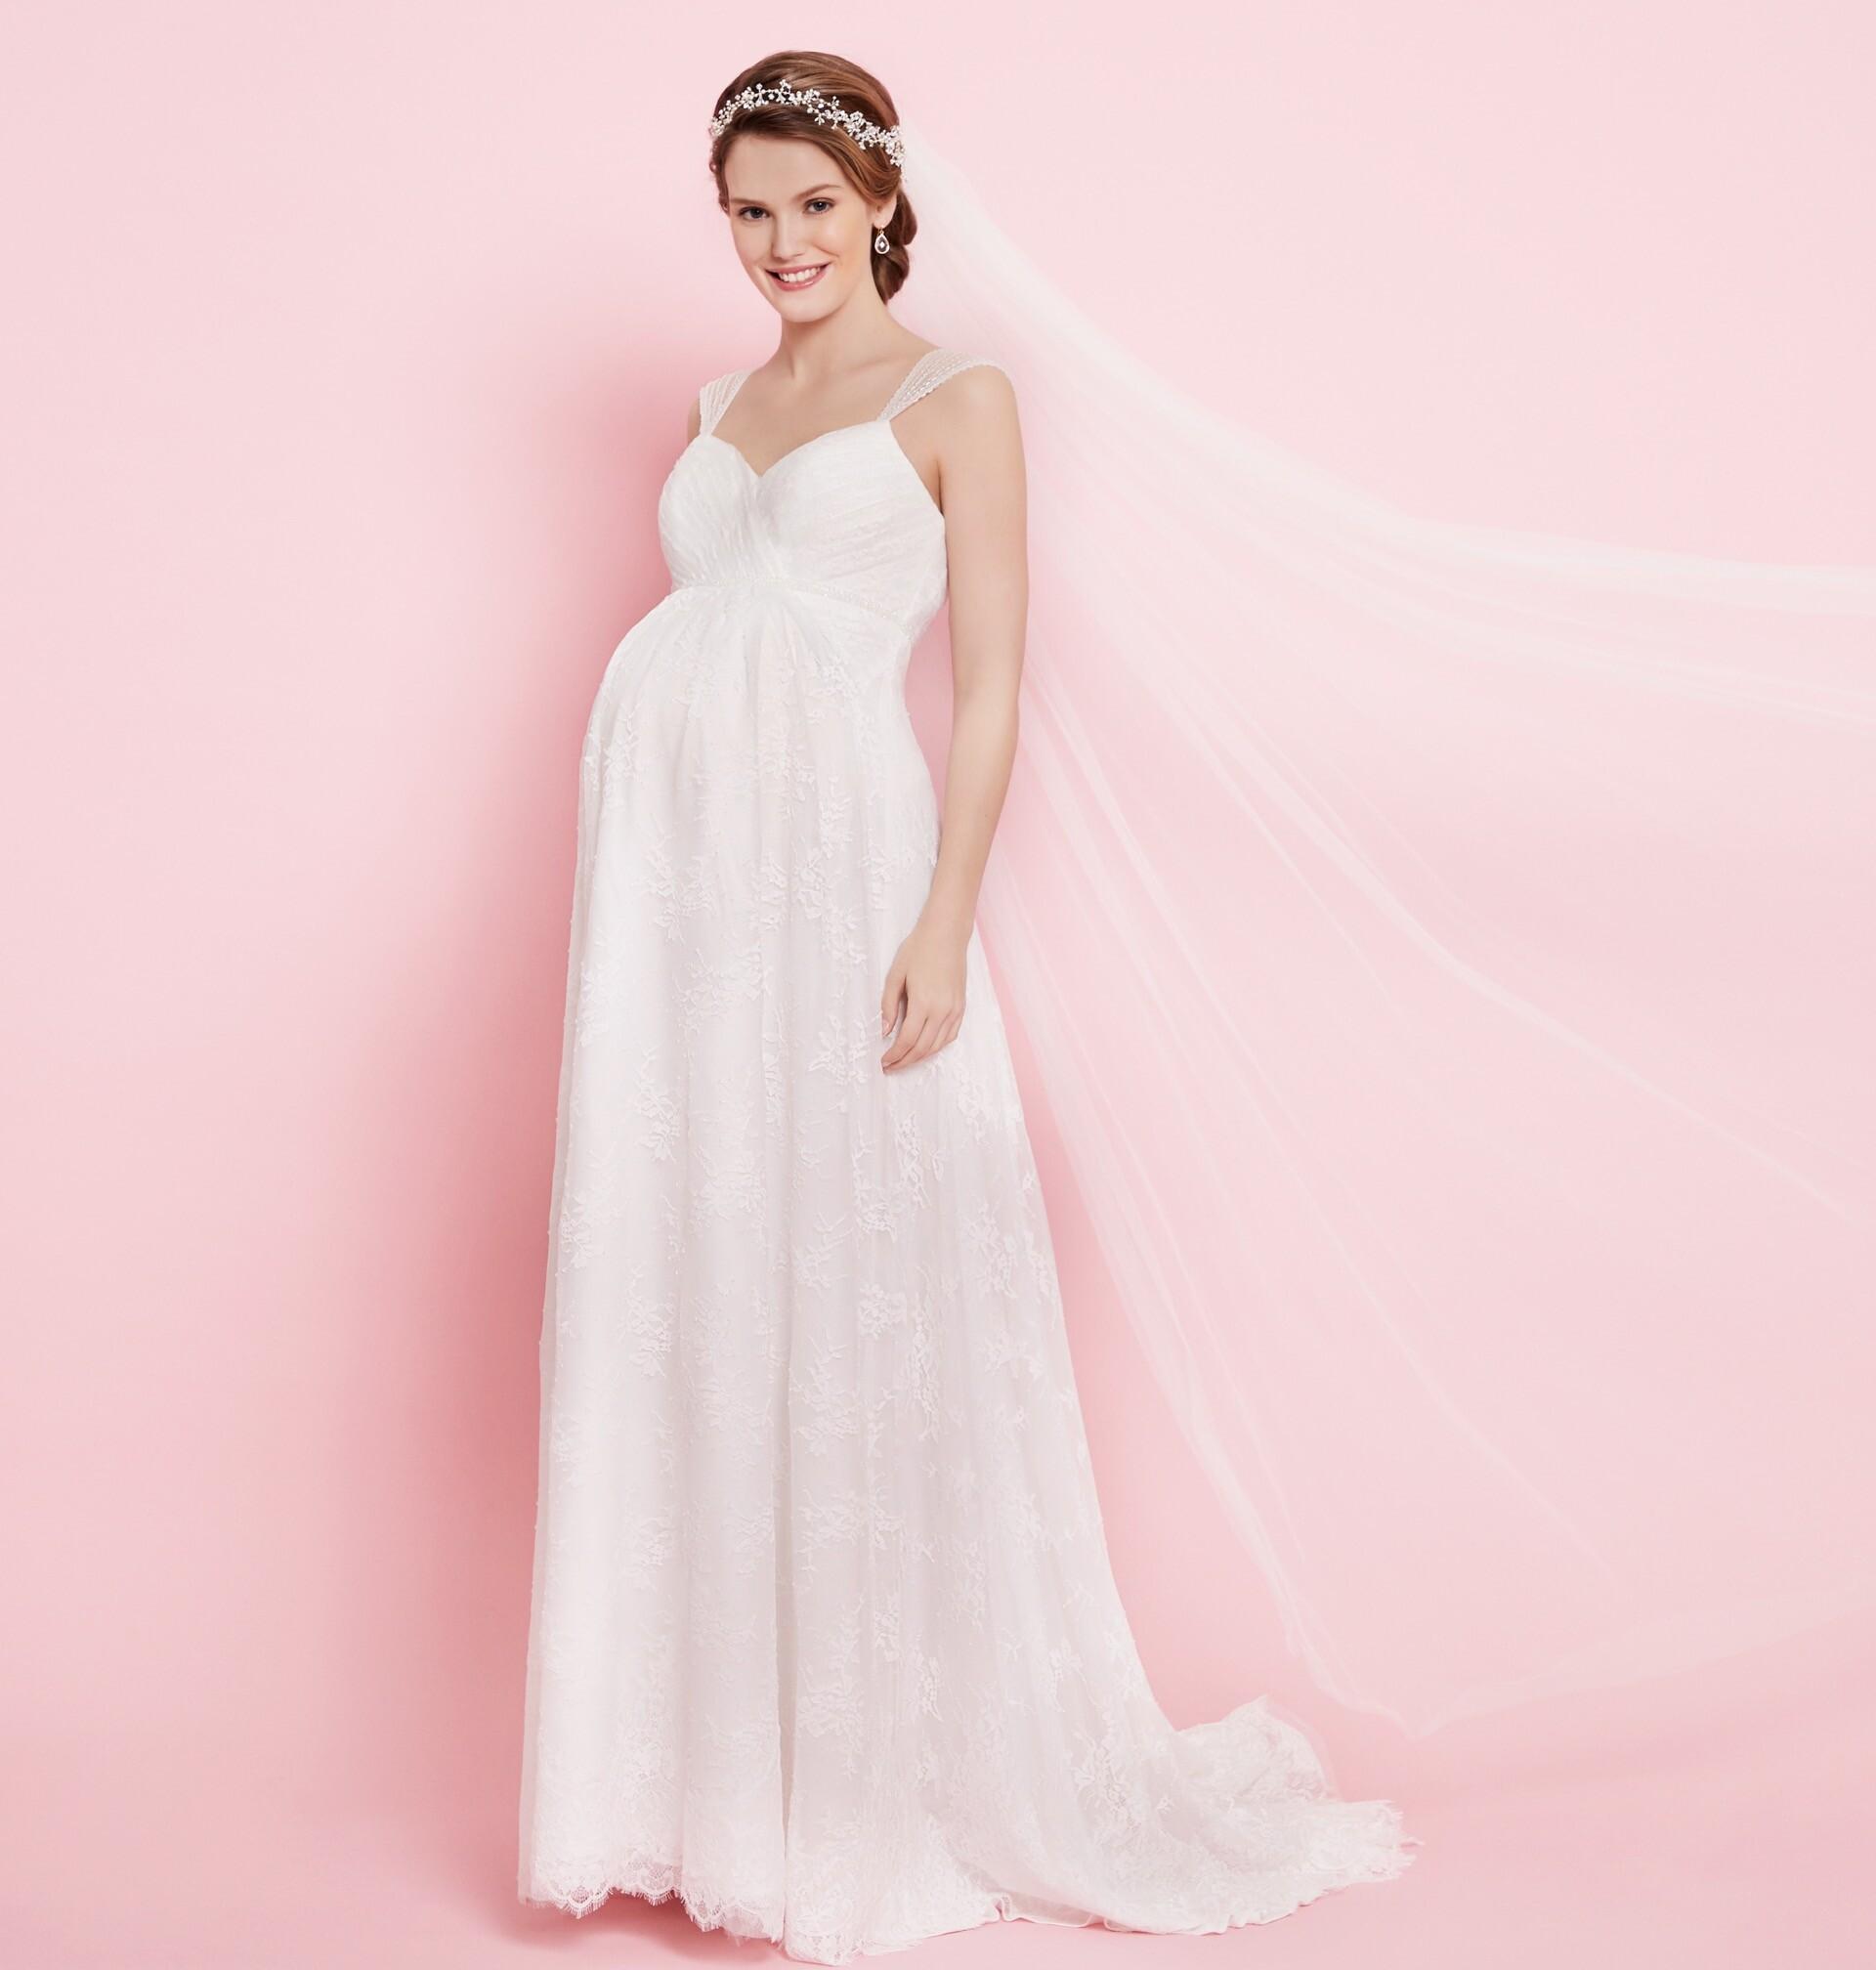 Brautkleid von Maternity by Lilly Style 08-2606